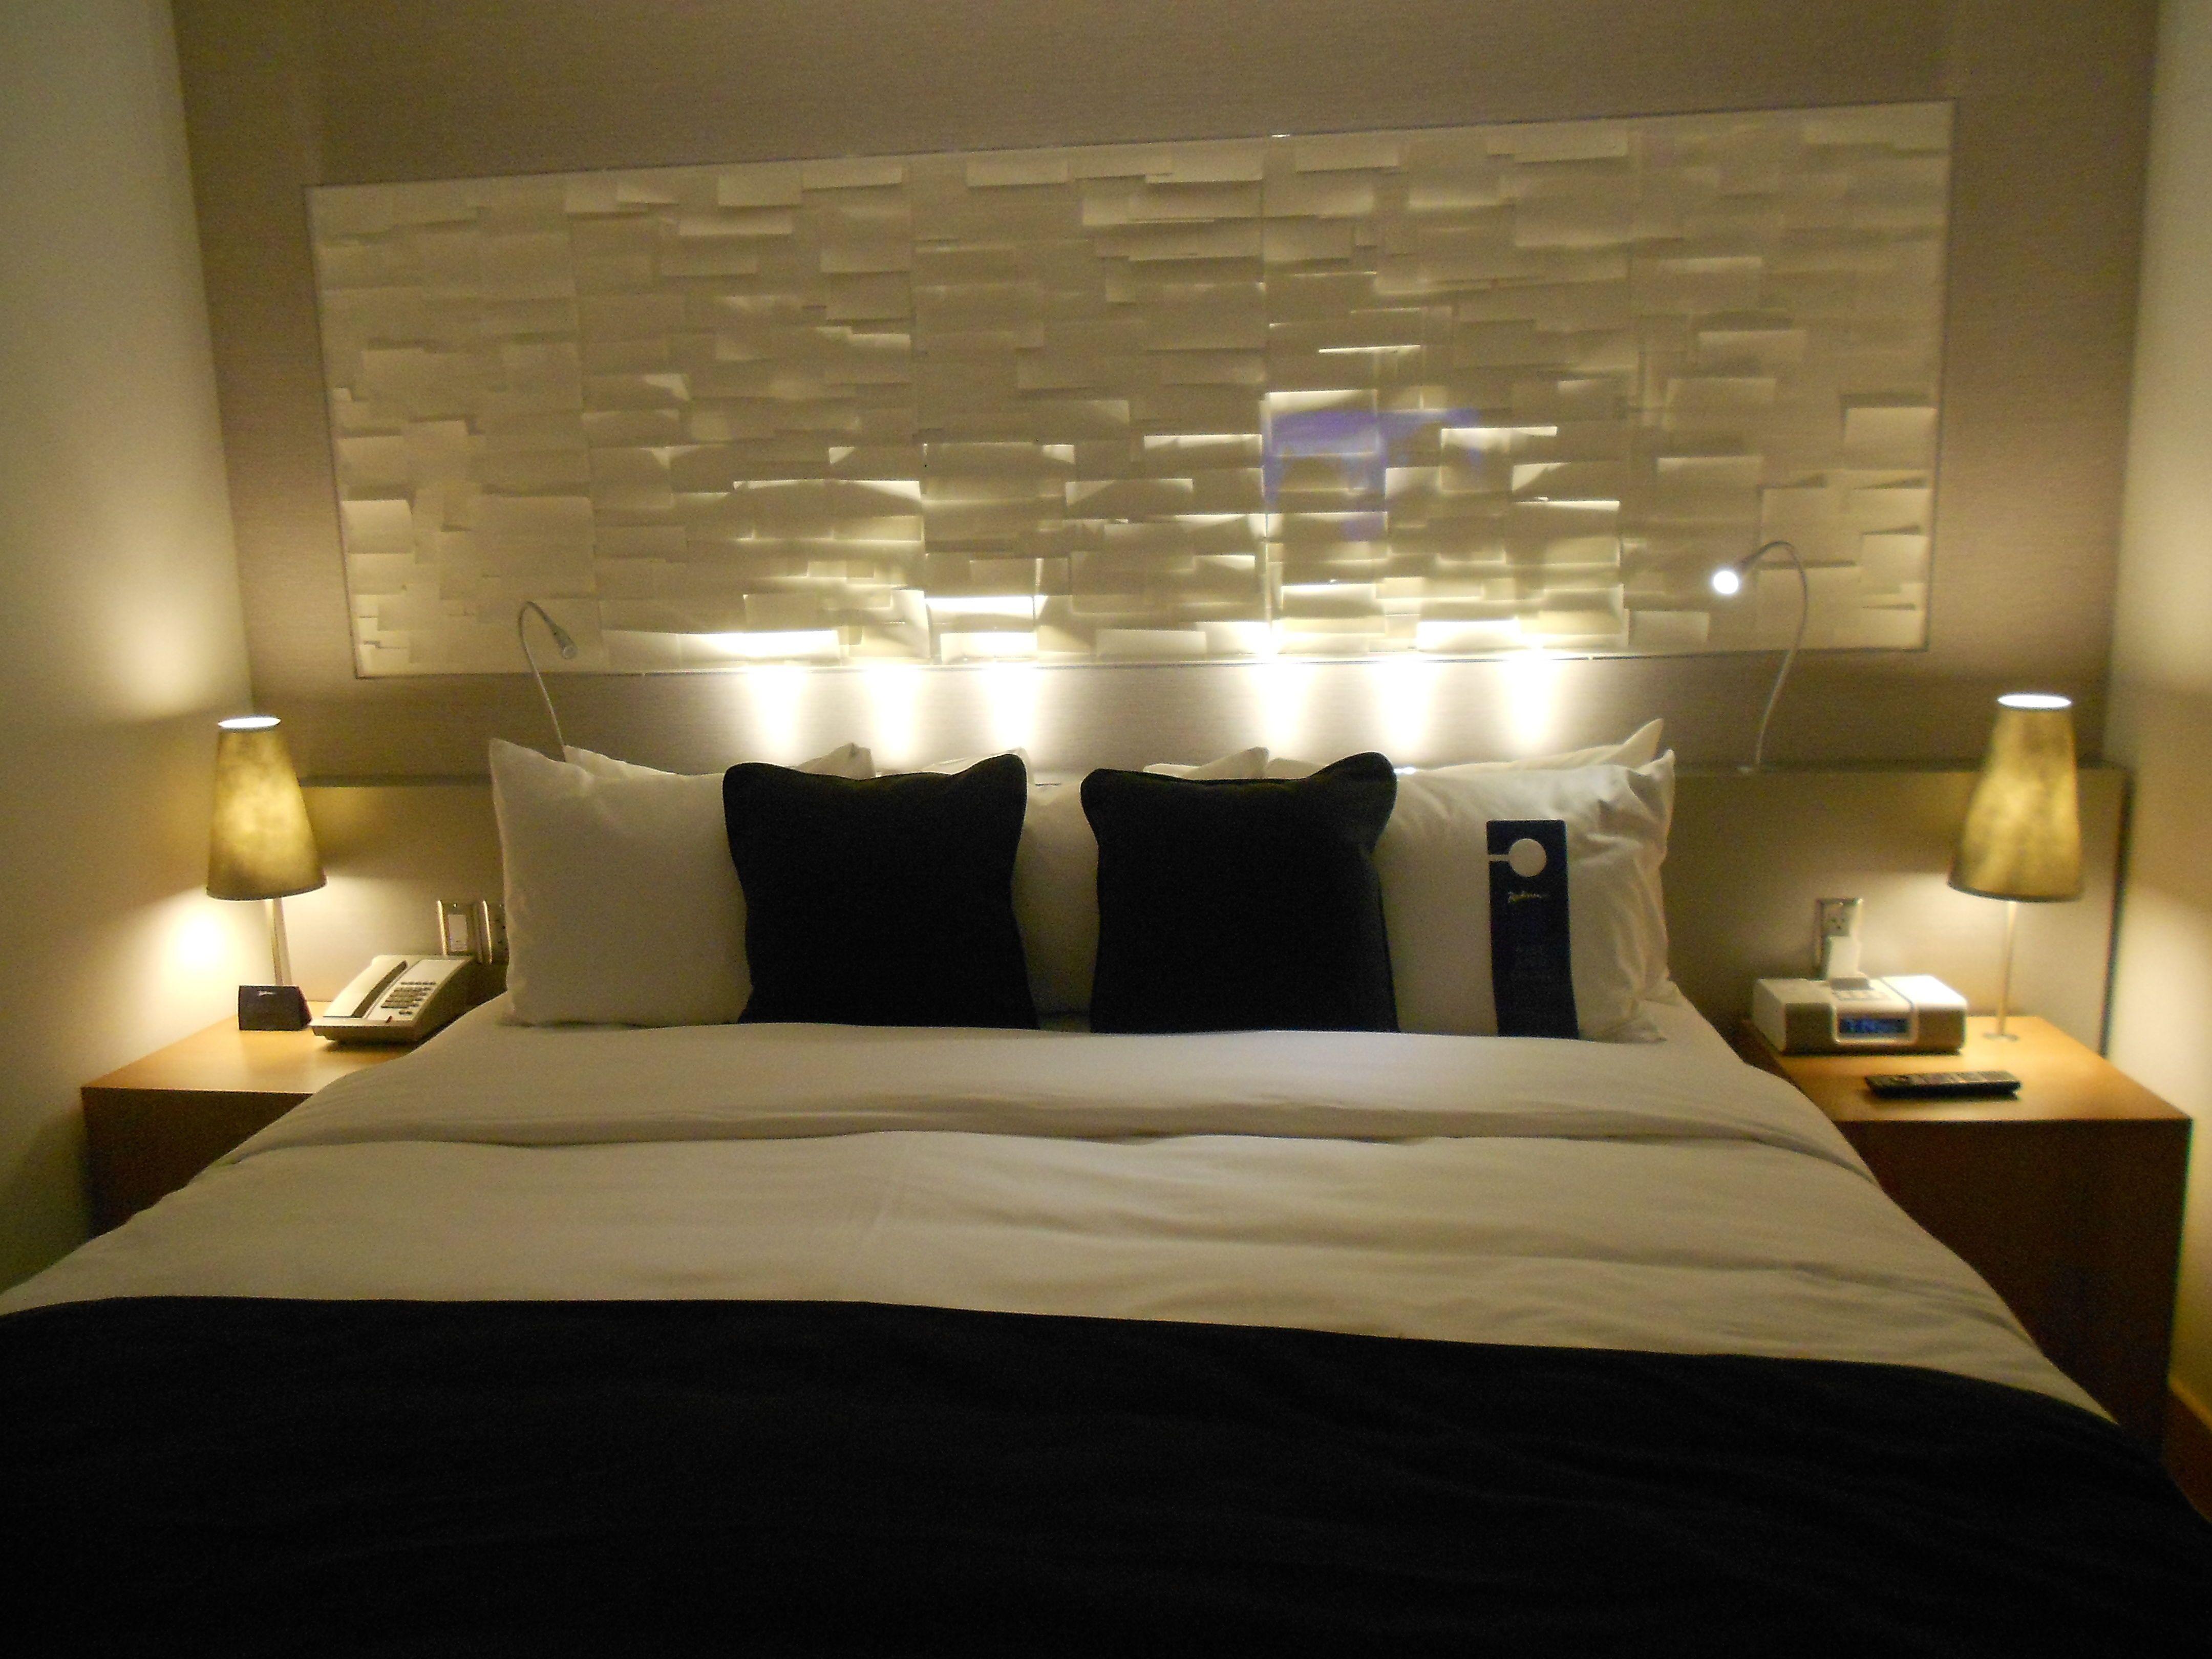 Etraordinary Diy King Size Headboard Ideas To Inspire Your Home Furniture Surripui Net Master Bedroom Headboard Ideas King Size Headboard Headboard Designs